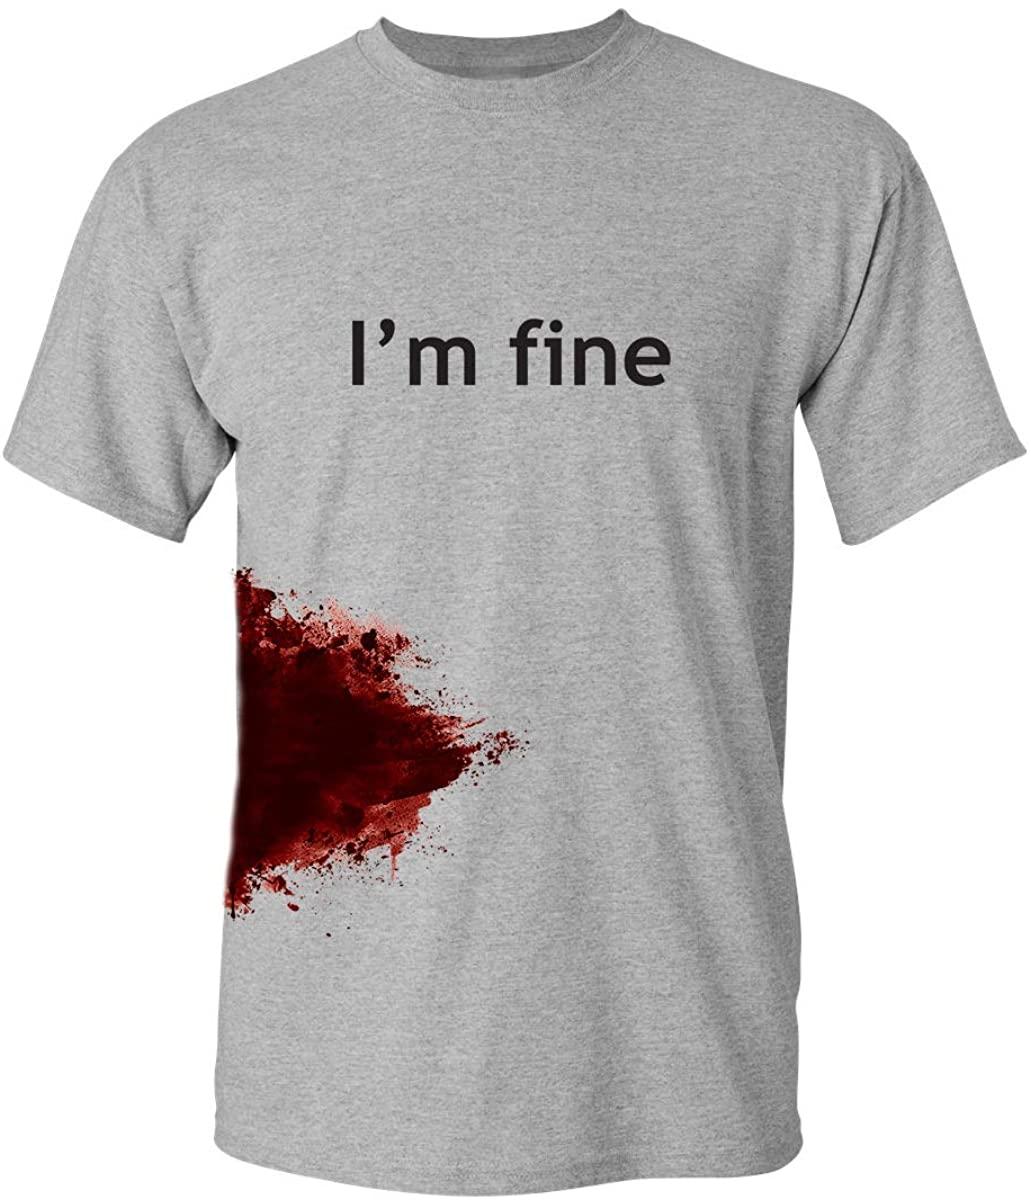 I'm Fine Graphic Novelty Sarcastic Movie Slash Humor Zombie Funny T Shirt